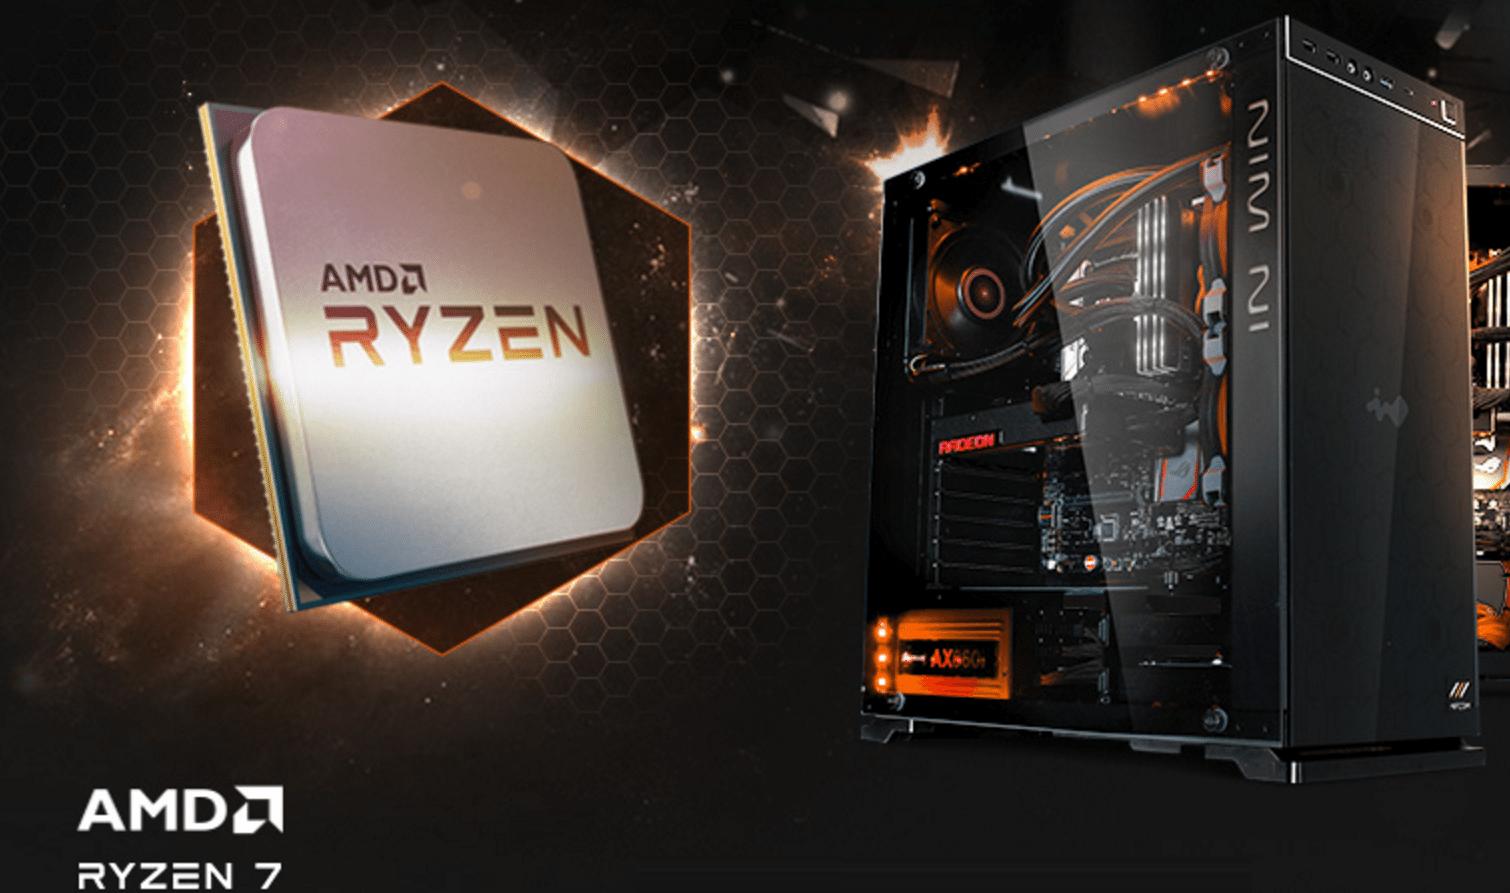 Benchmarks de AMD Ryzen 1700X VS Intel i7 6800K en 13 videojuegos